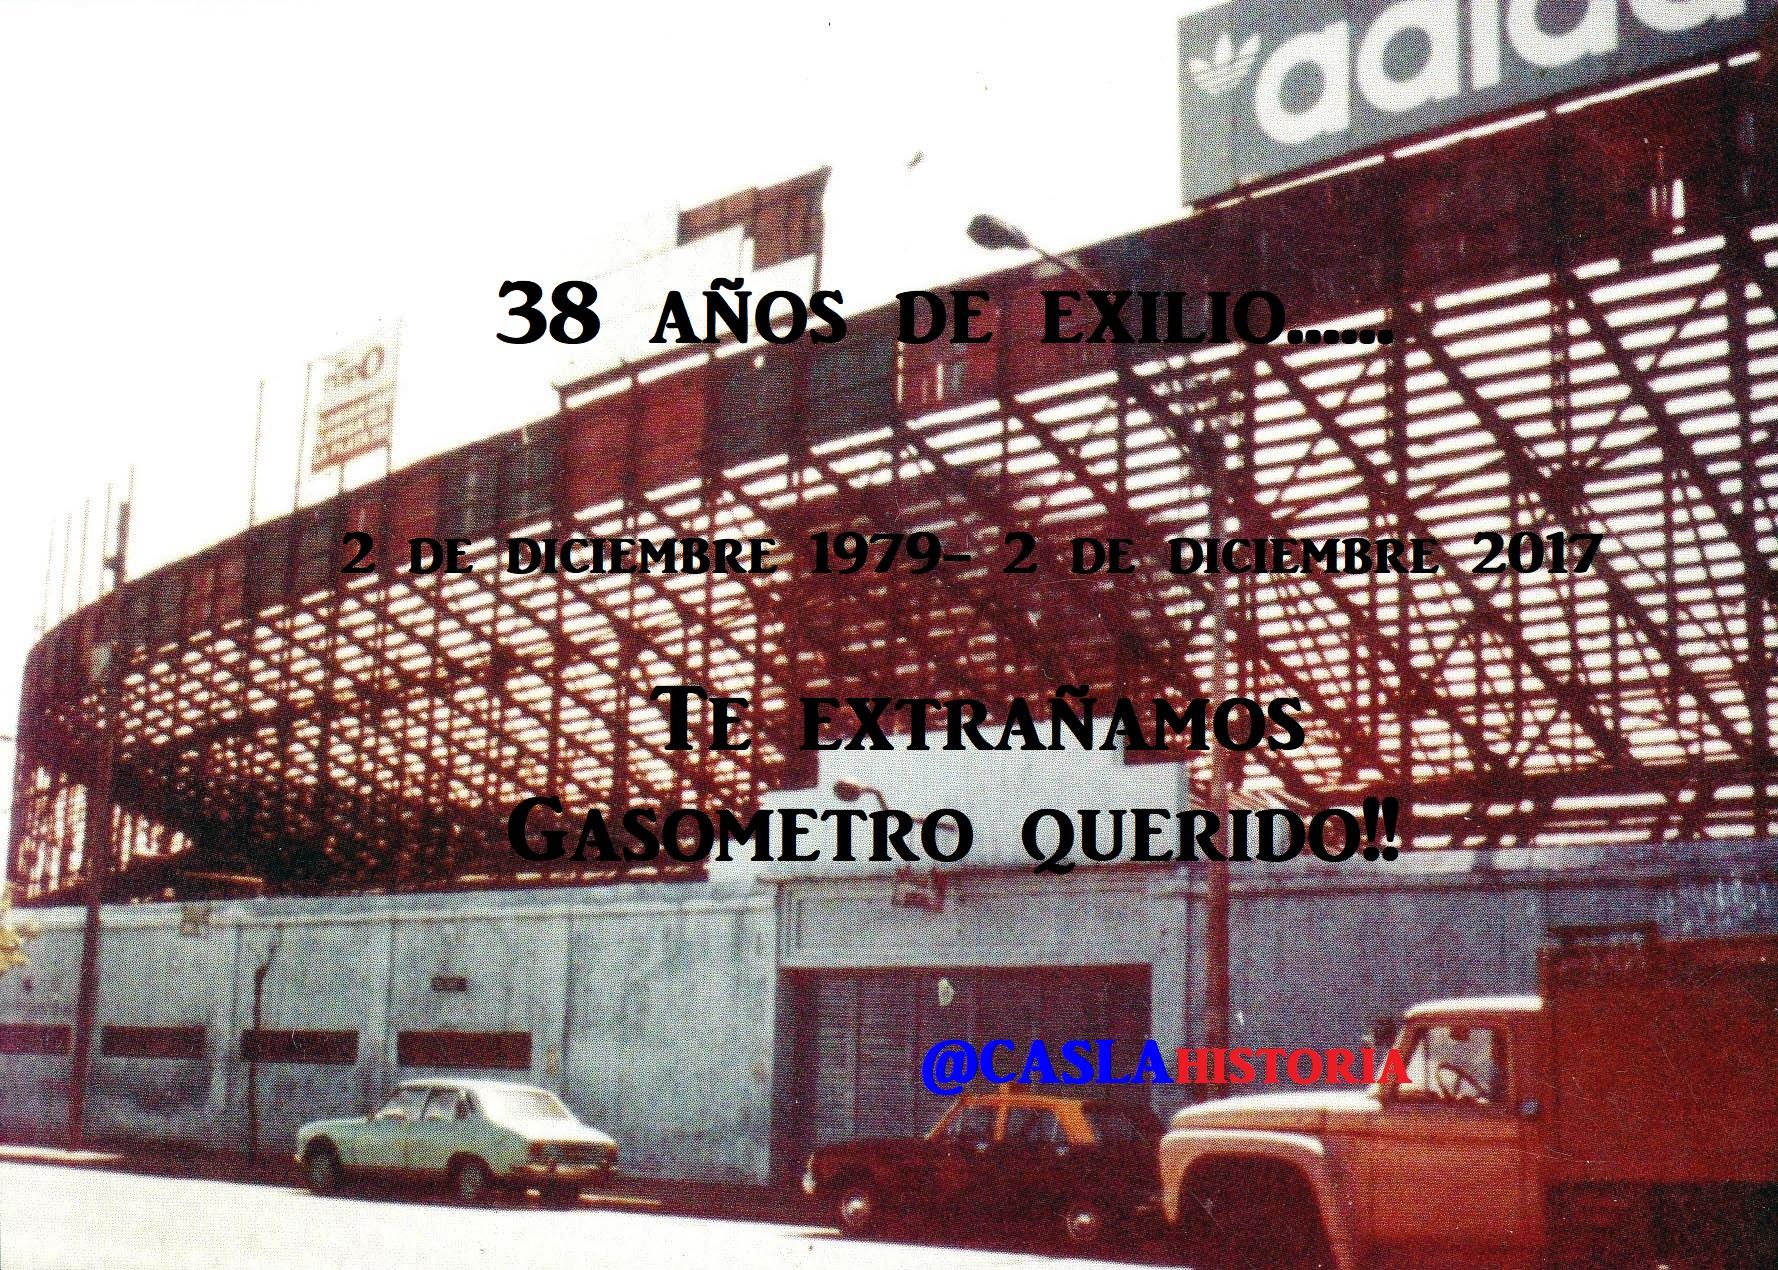 gasometro 1979